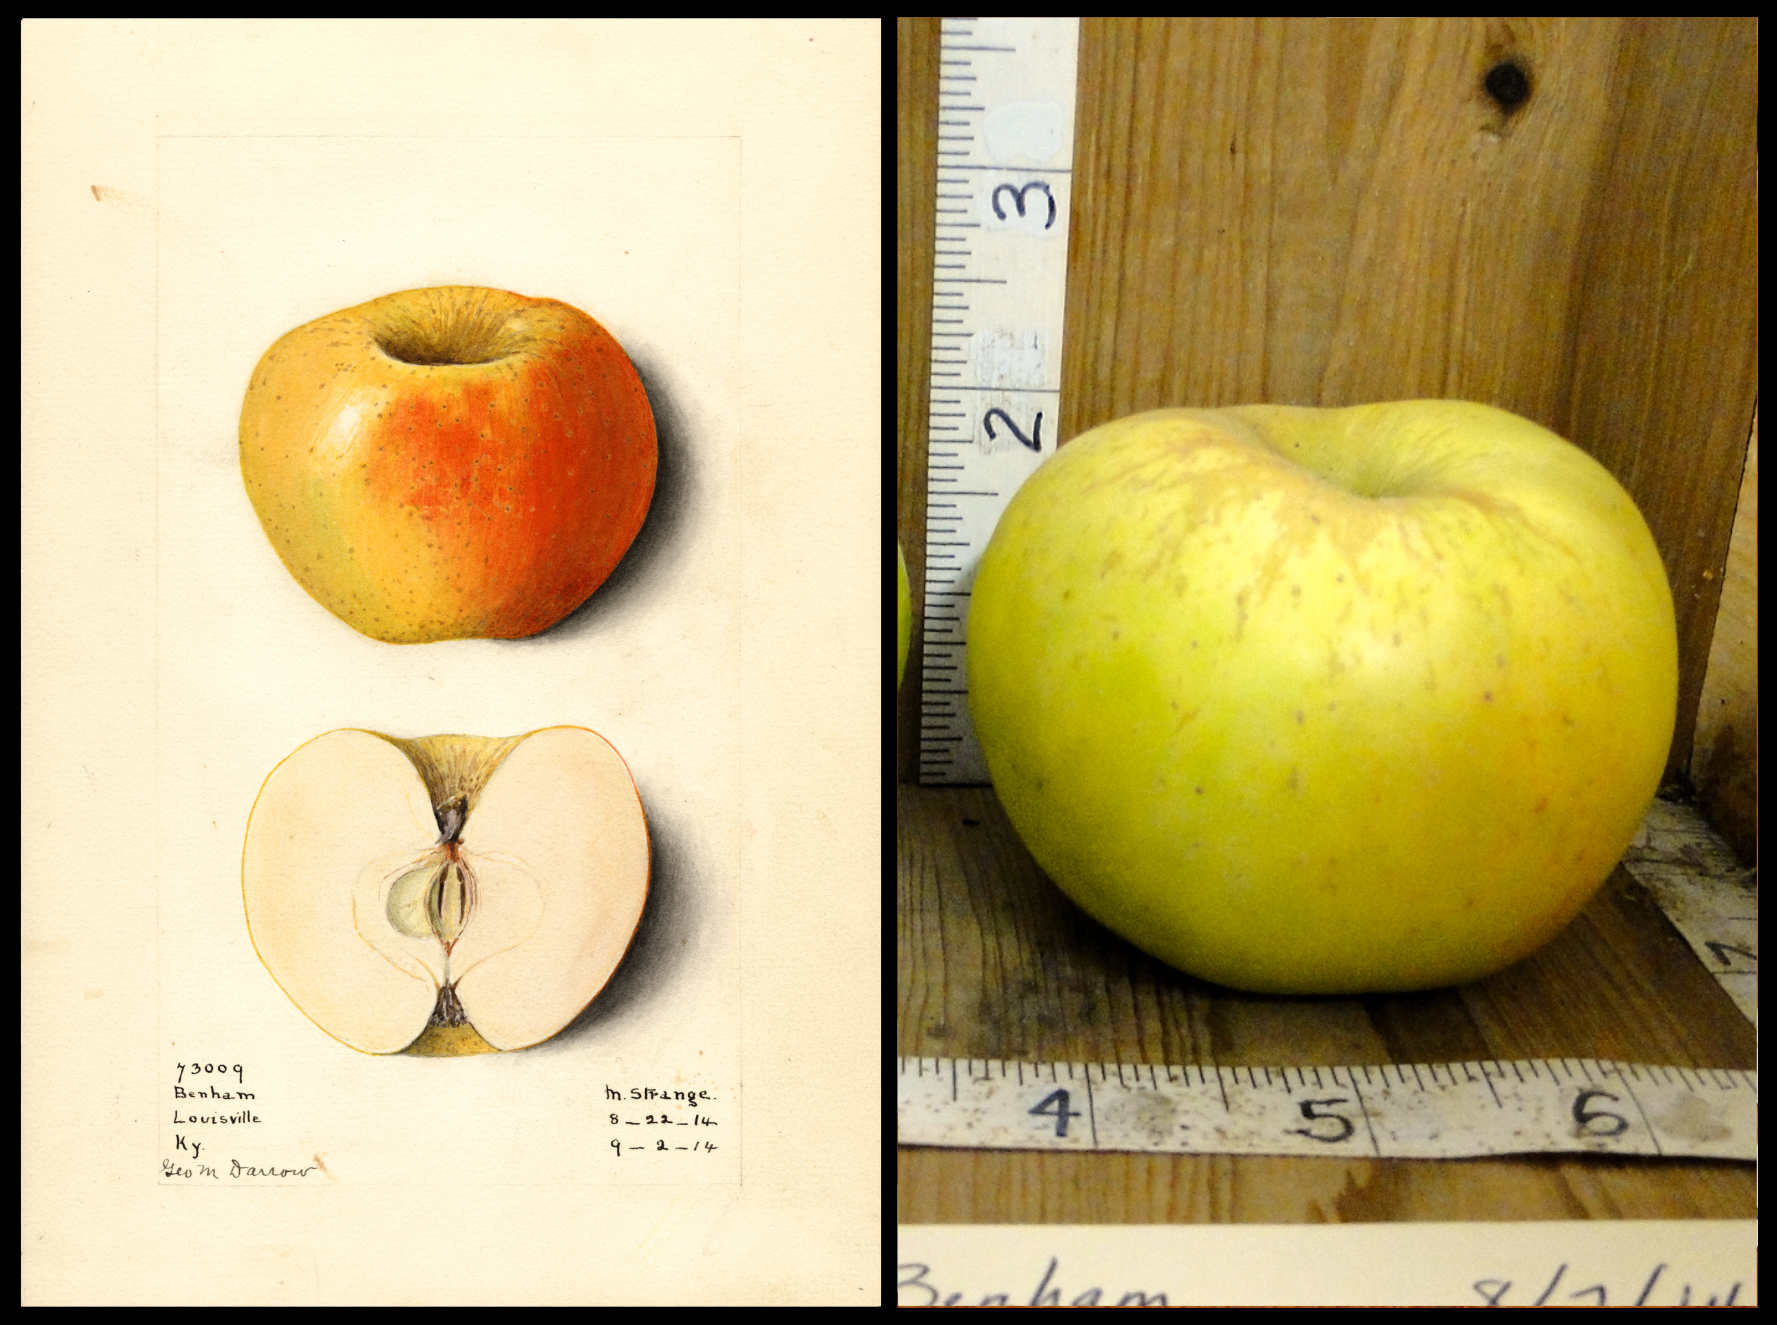 greenish yellow apple with slight blush